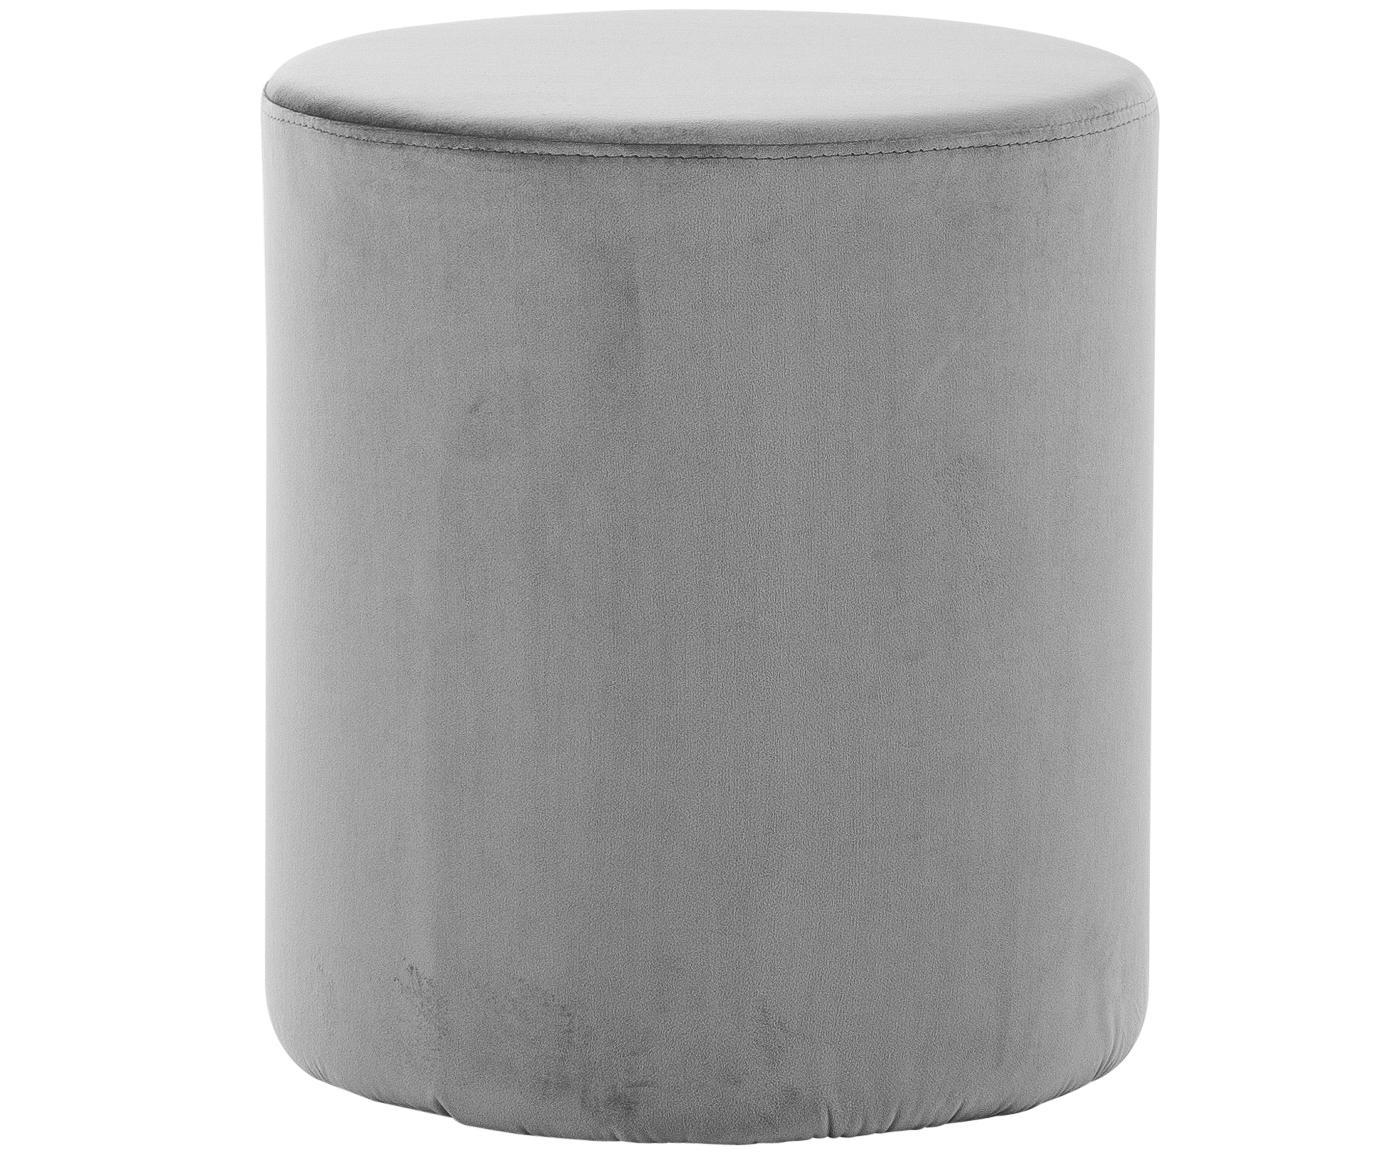 Samt-Hocker Daisy, Bezug: Samt (Polyester) 15.000 S, Rahmen: Mitteldichte Holzfaserpla, Grau, Ø 38 x H 46 cm